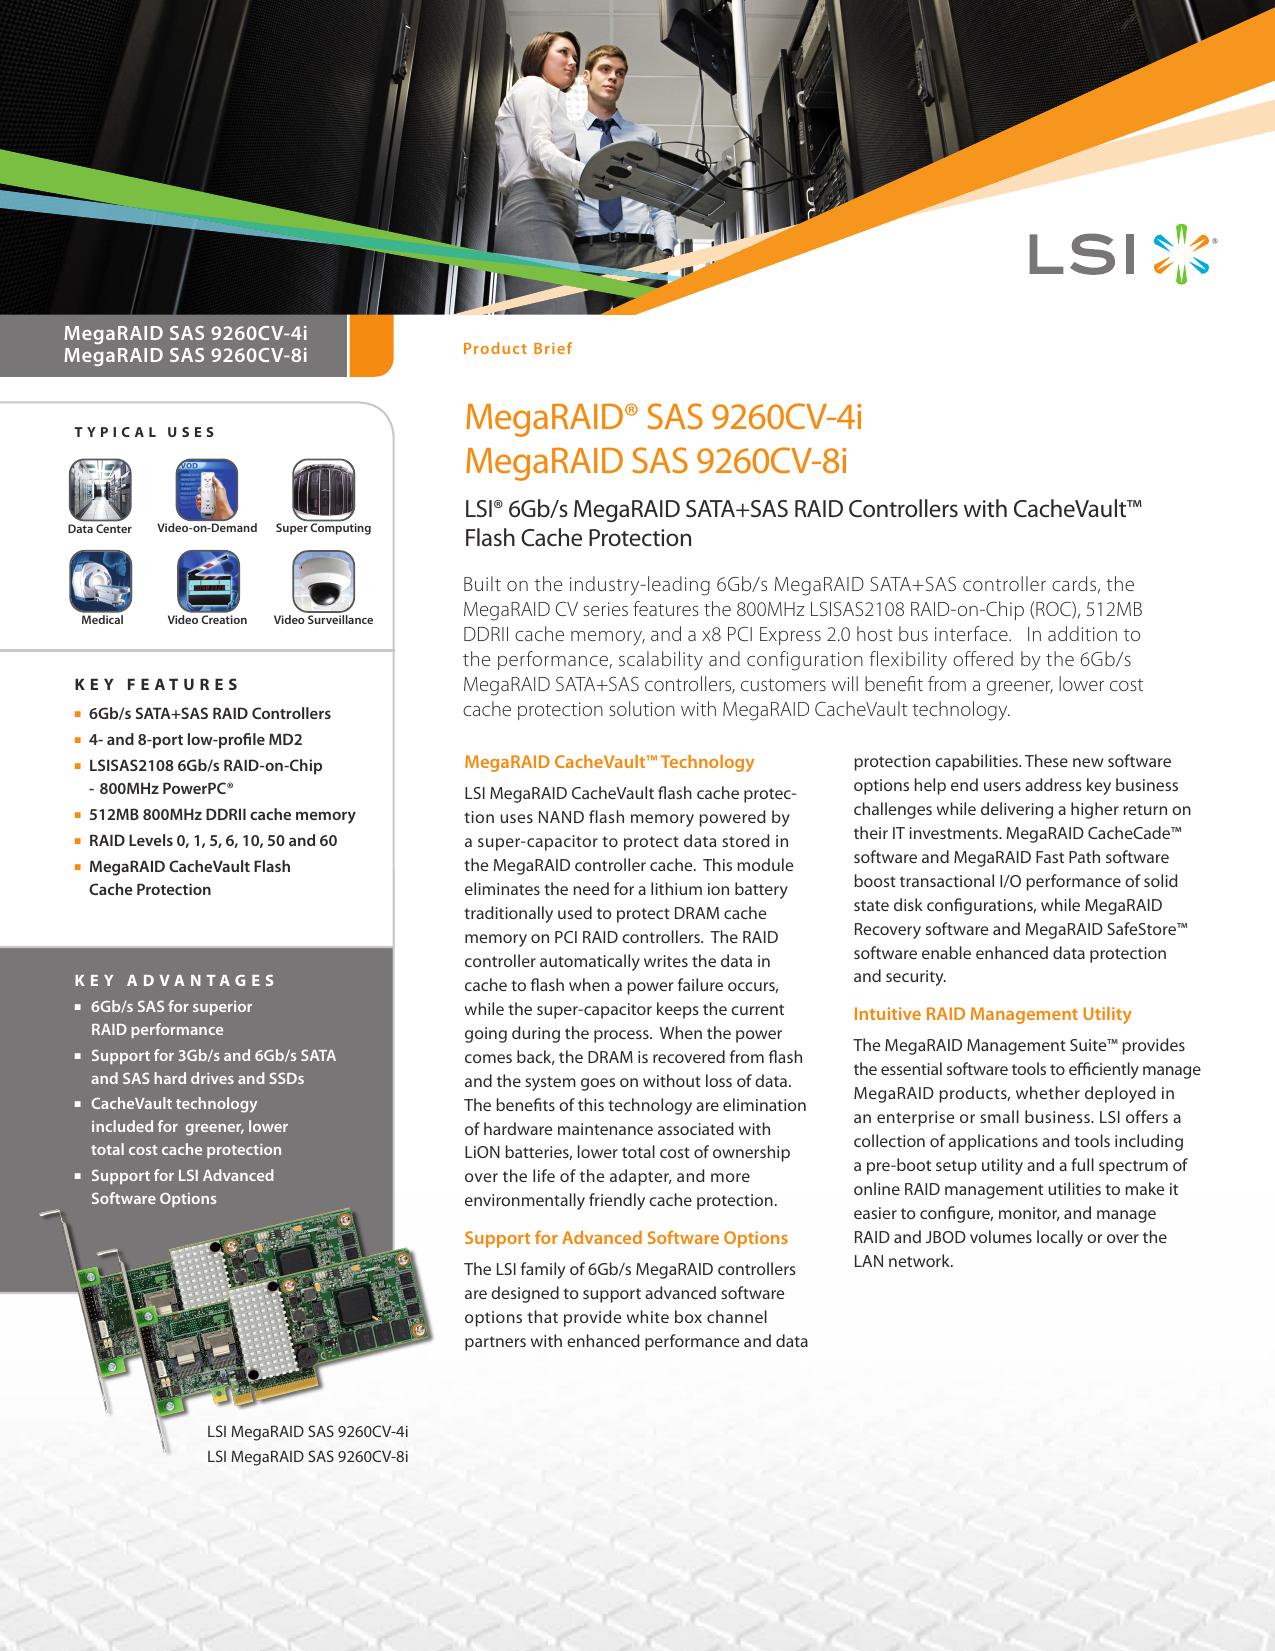 MegaRAID® SAS 9260CV-4i MegaRAID SAS 9260CV-8i | manualzz com